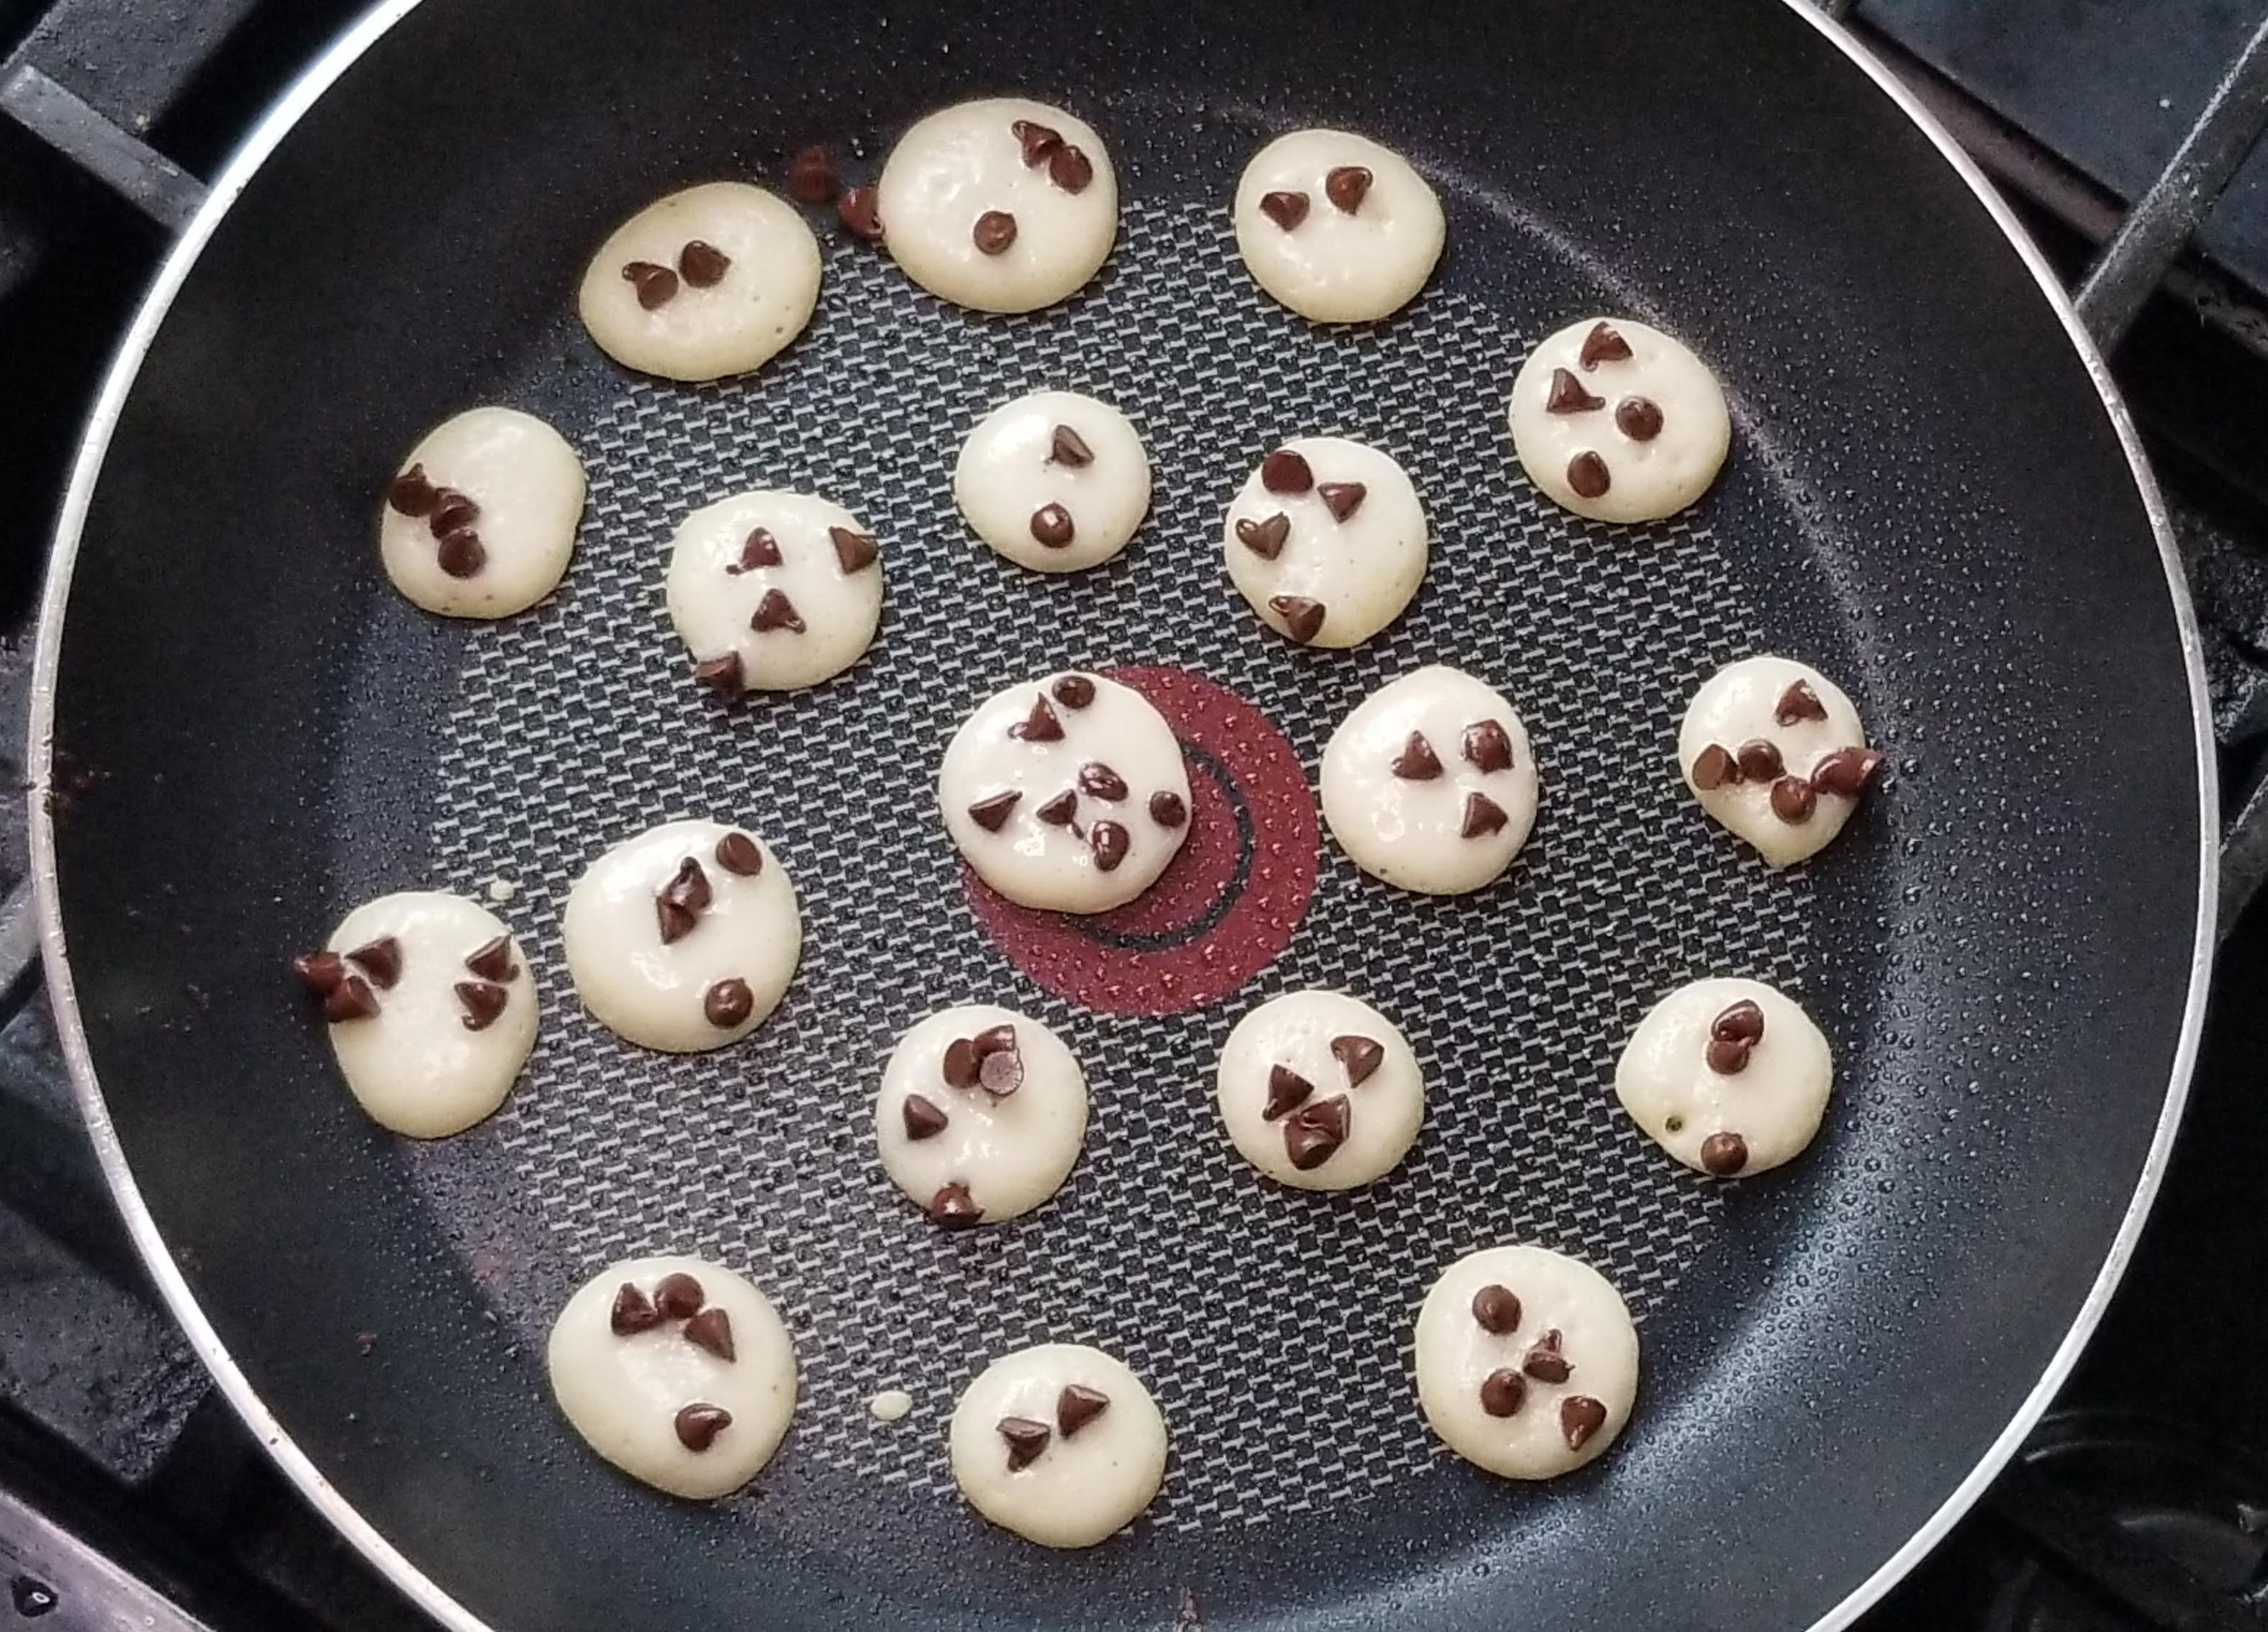 tiktok viral foods pancake cereal batter